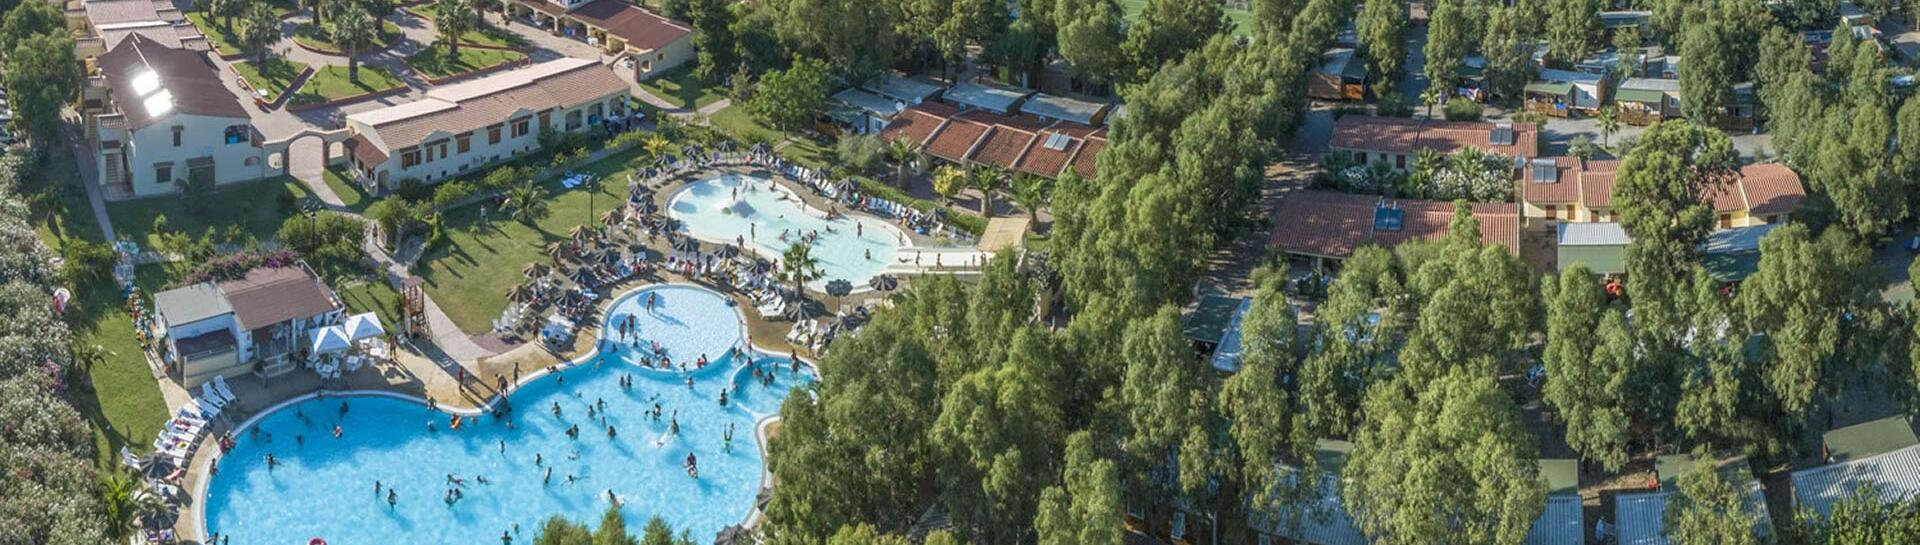 4mori en holiday-resort-sardinia 011